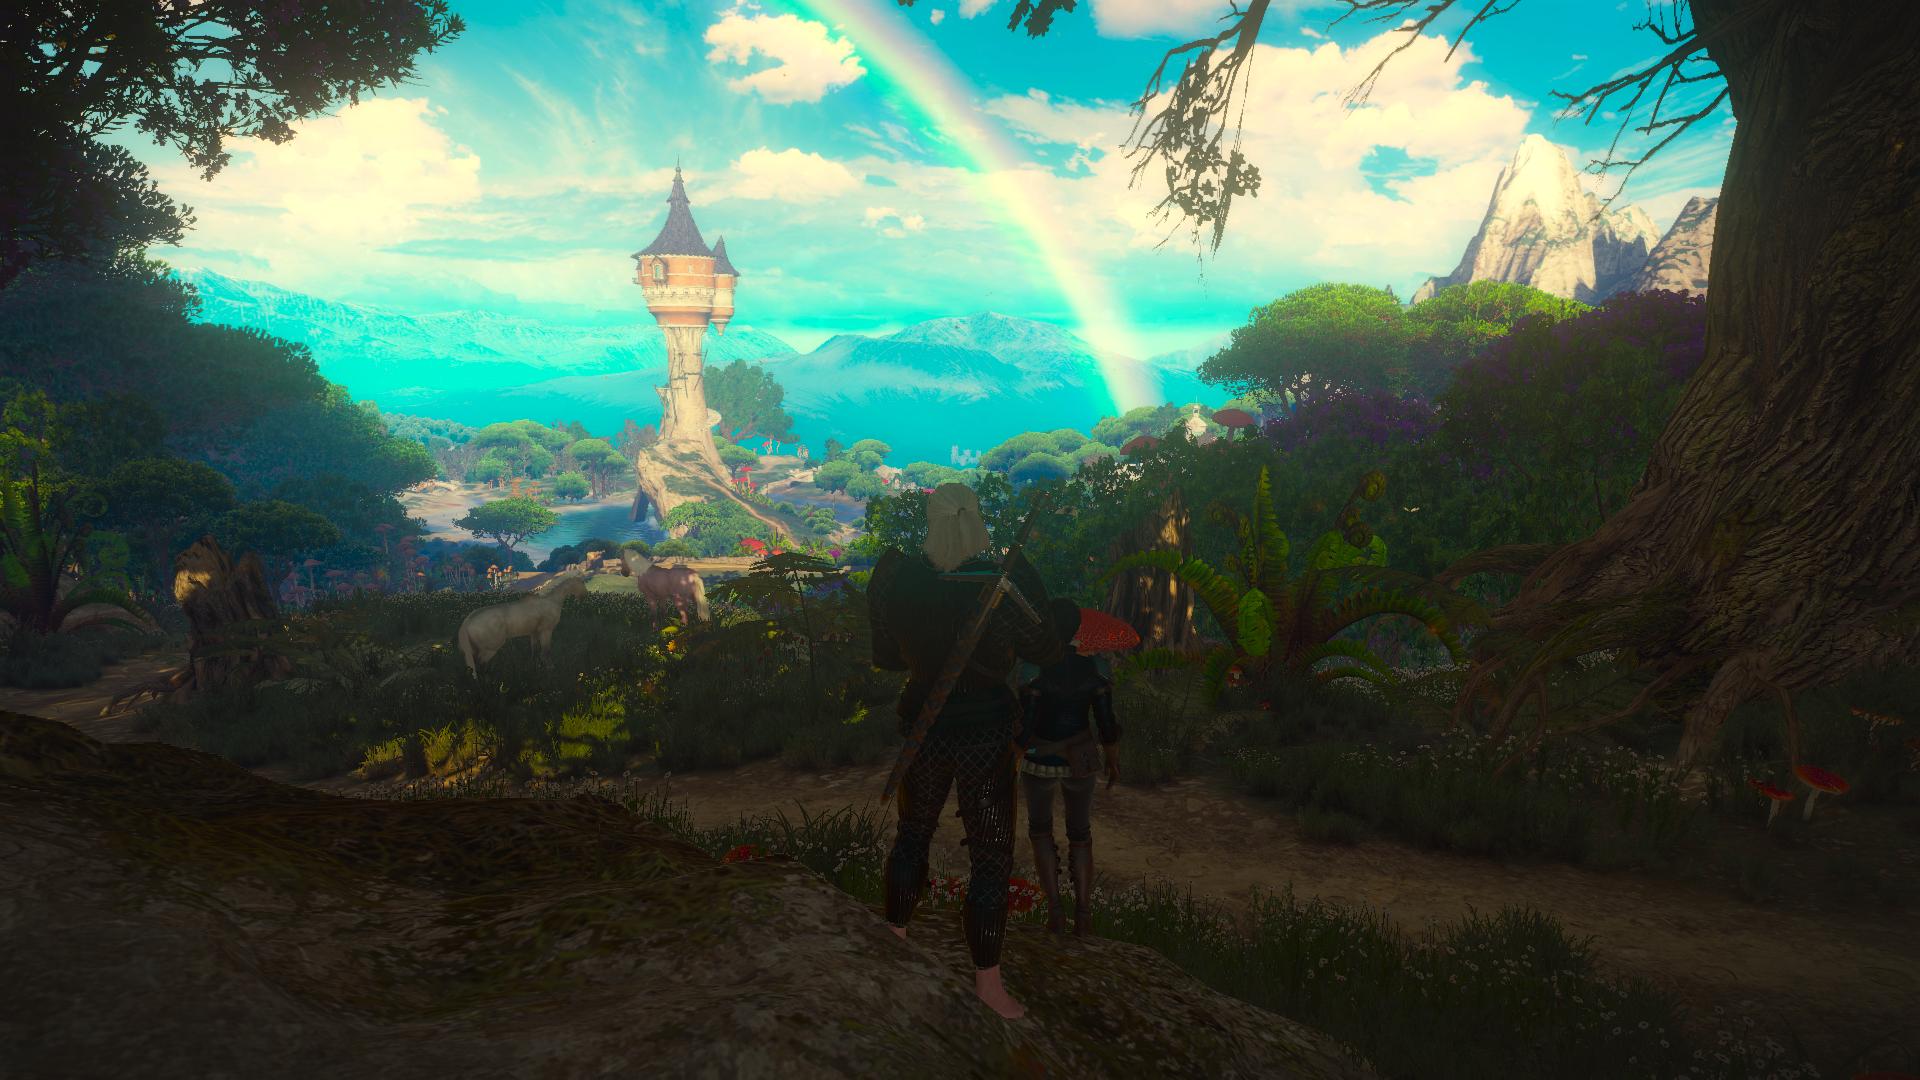 电子游戏 - 巫师3:狂猎  Geralt of Rivia The Witcher 3: Wild Hunt - Blood and Wine 壁纸